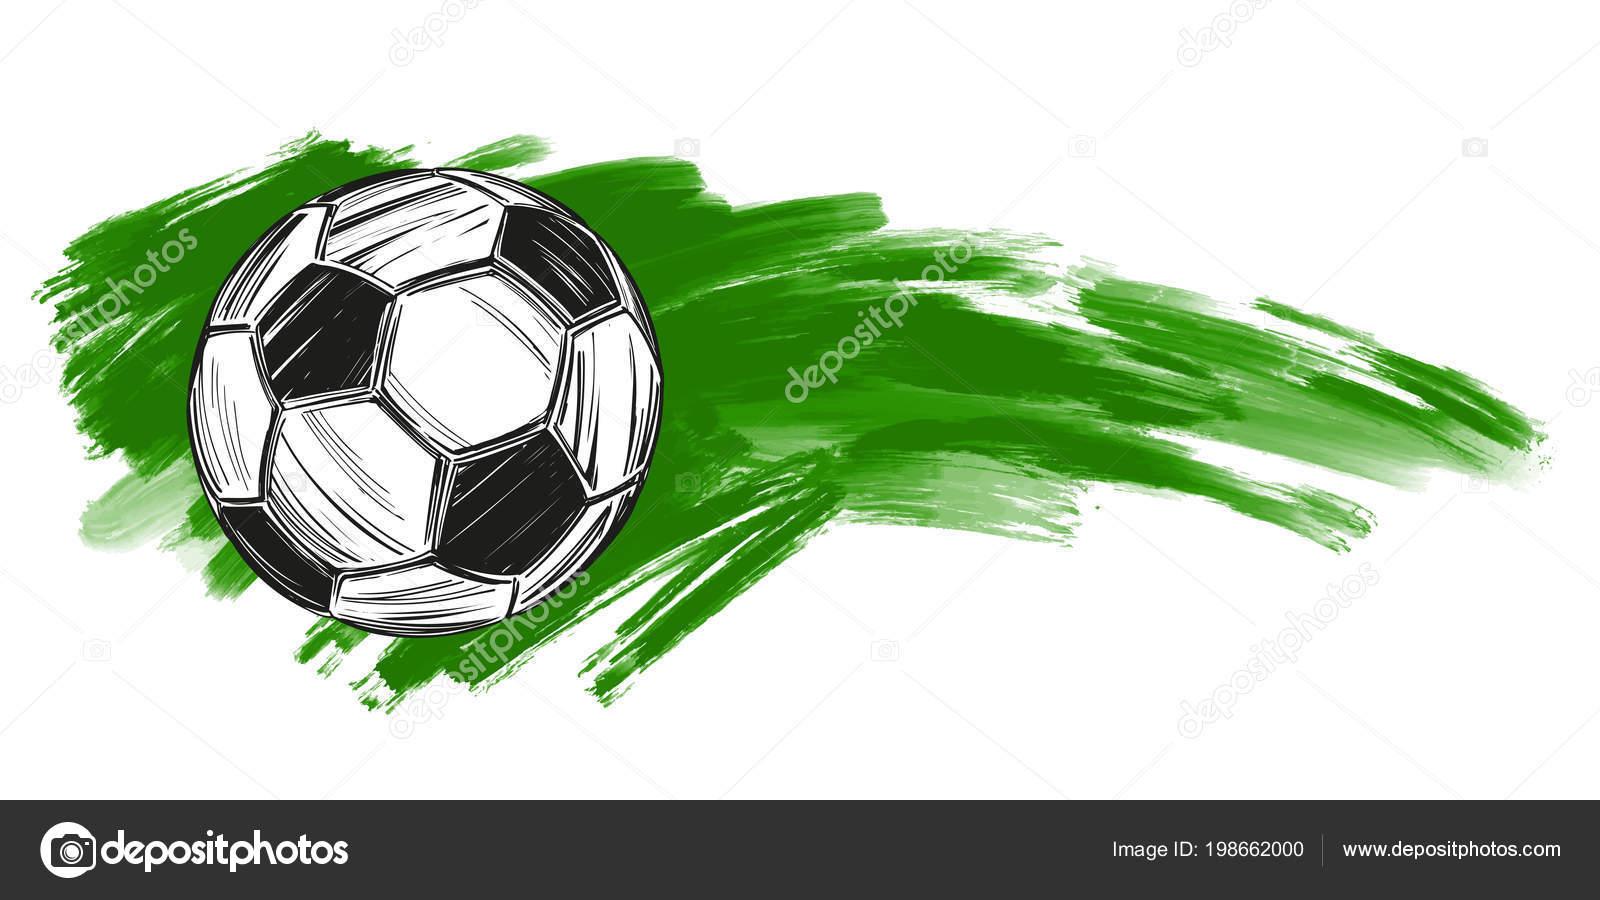 Fussball Fussball Russische Flagge Sportspiel Emblem Schild